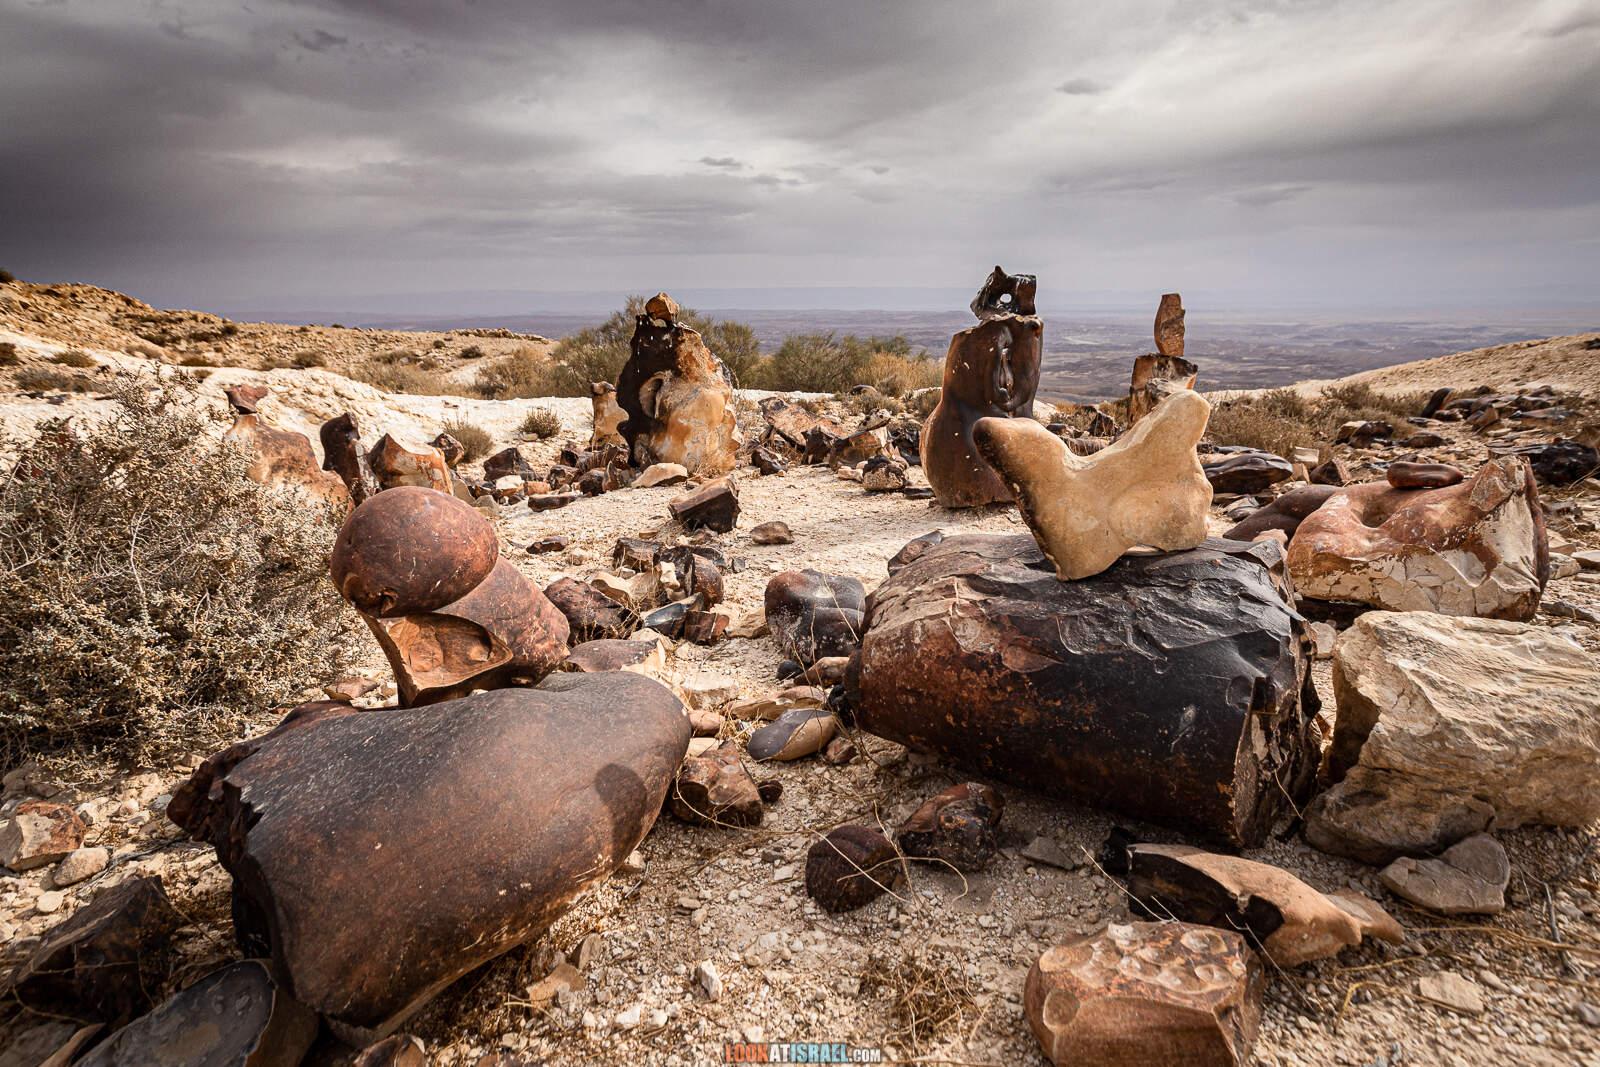 Храм эпохи палеолита на горе Карком | The Paleolithic Temple on mount Karkom | המקדש הפליאוליתי בהר כרכום